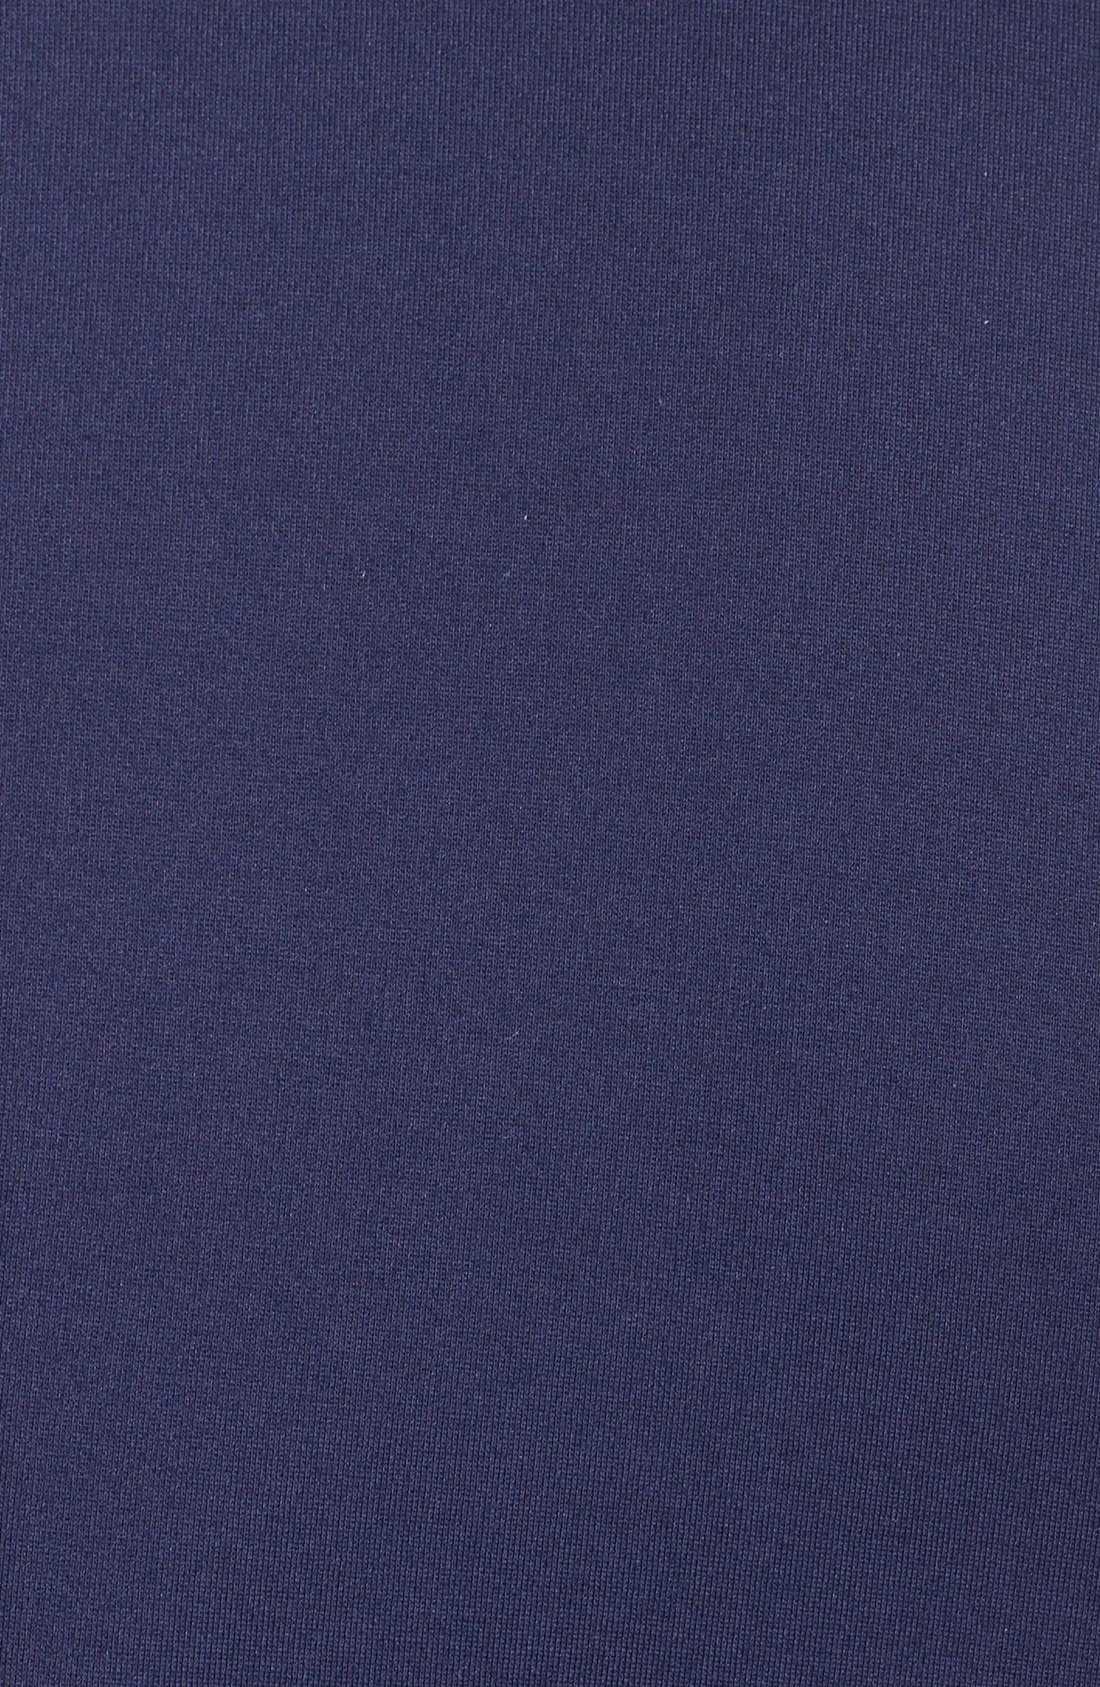 Belted Ponte V-Neck Sheath Dress,                             Alternate thumbnail 5, color,                             Navy Peacoat